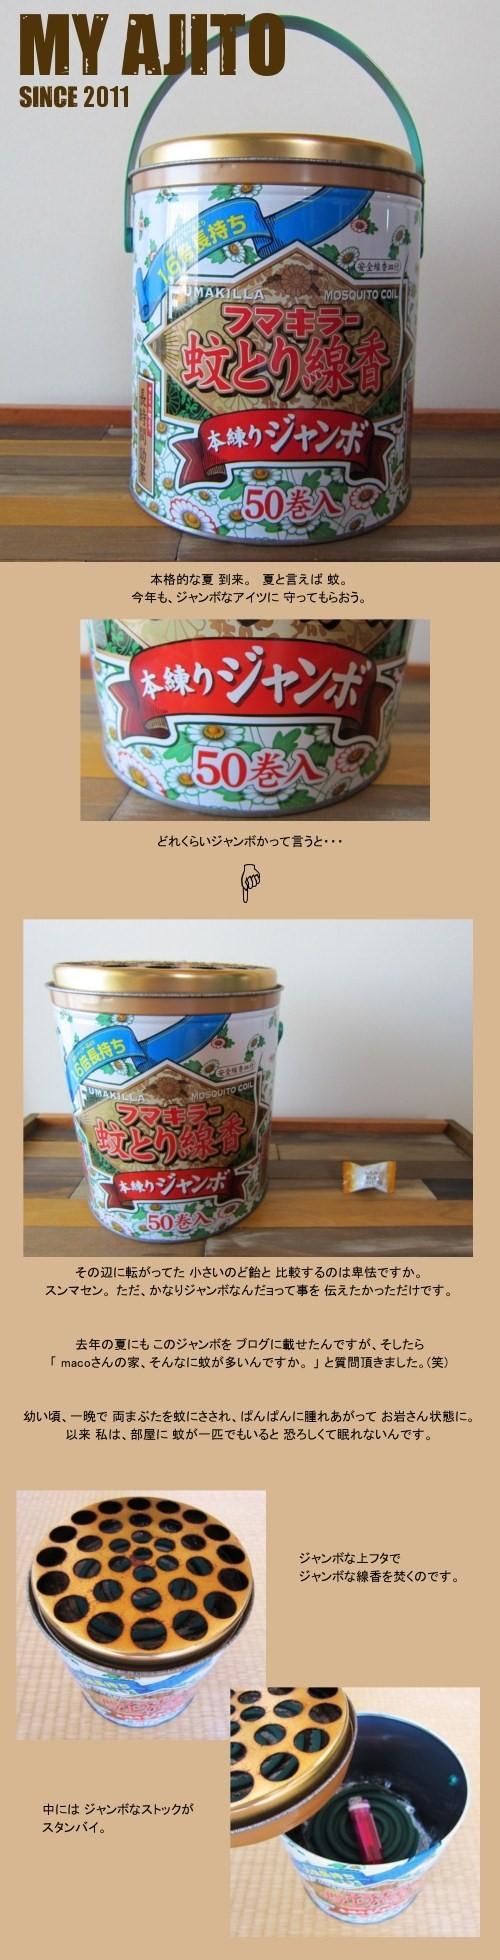 natsu_item_01.jpg